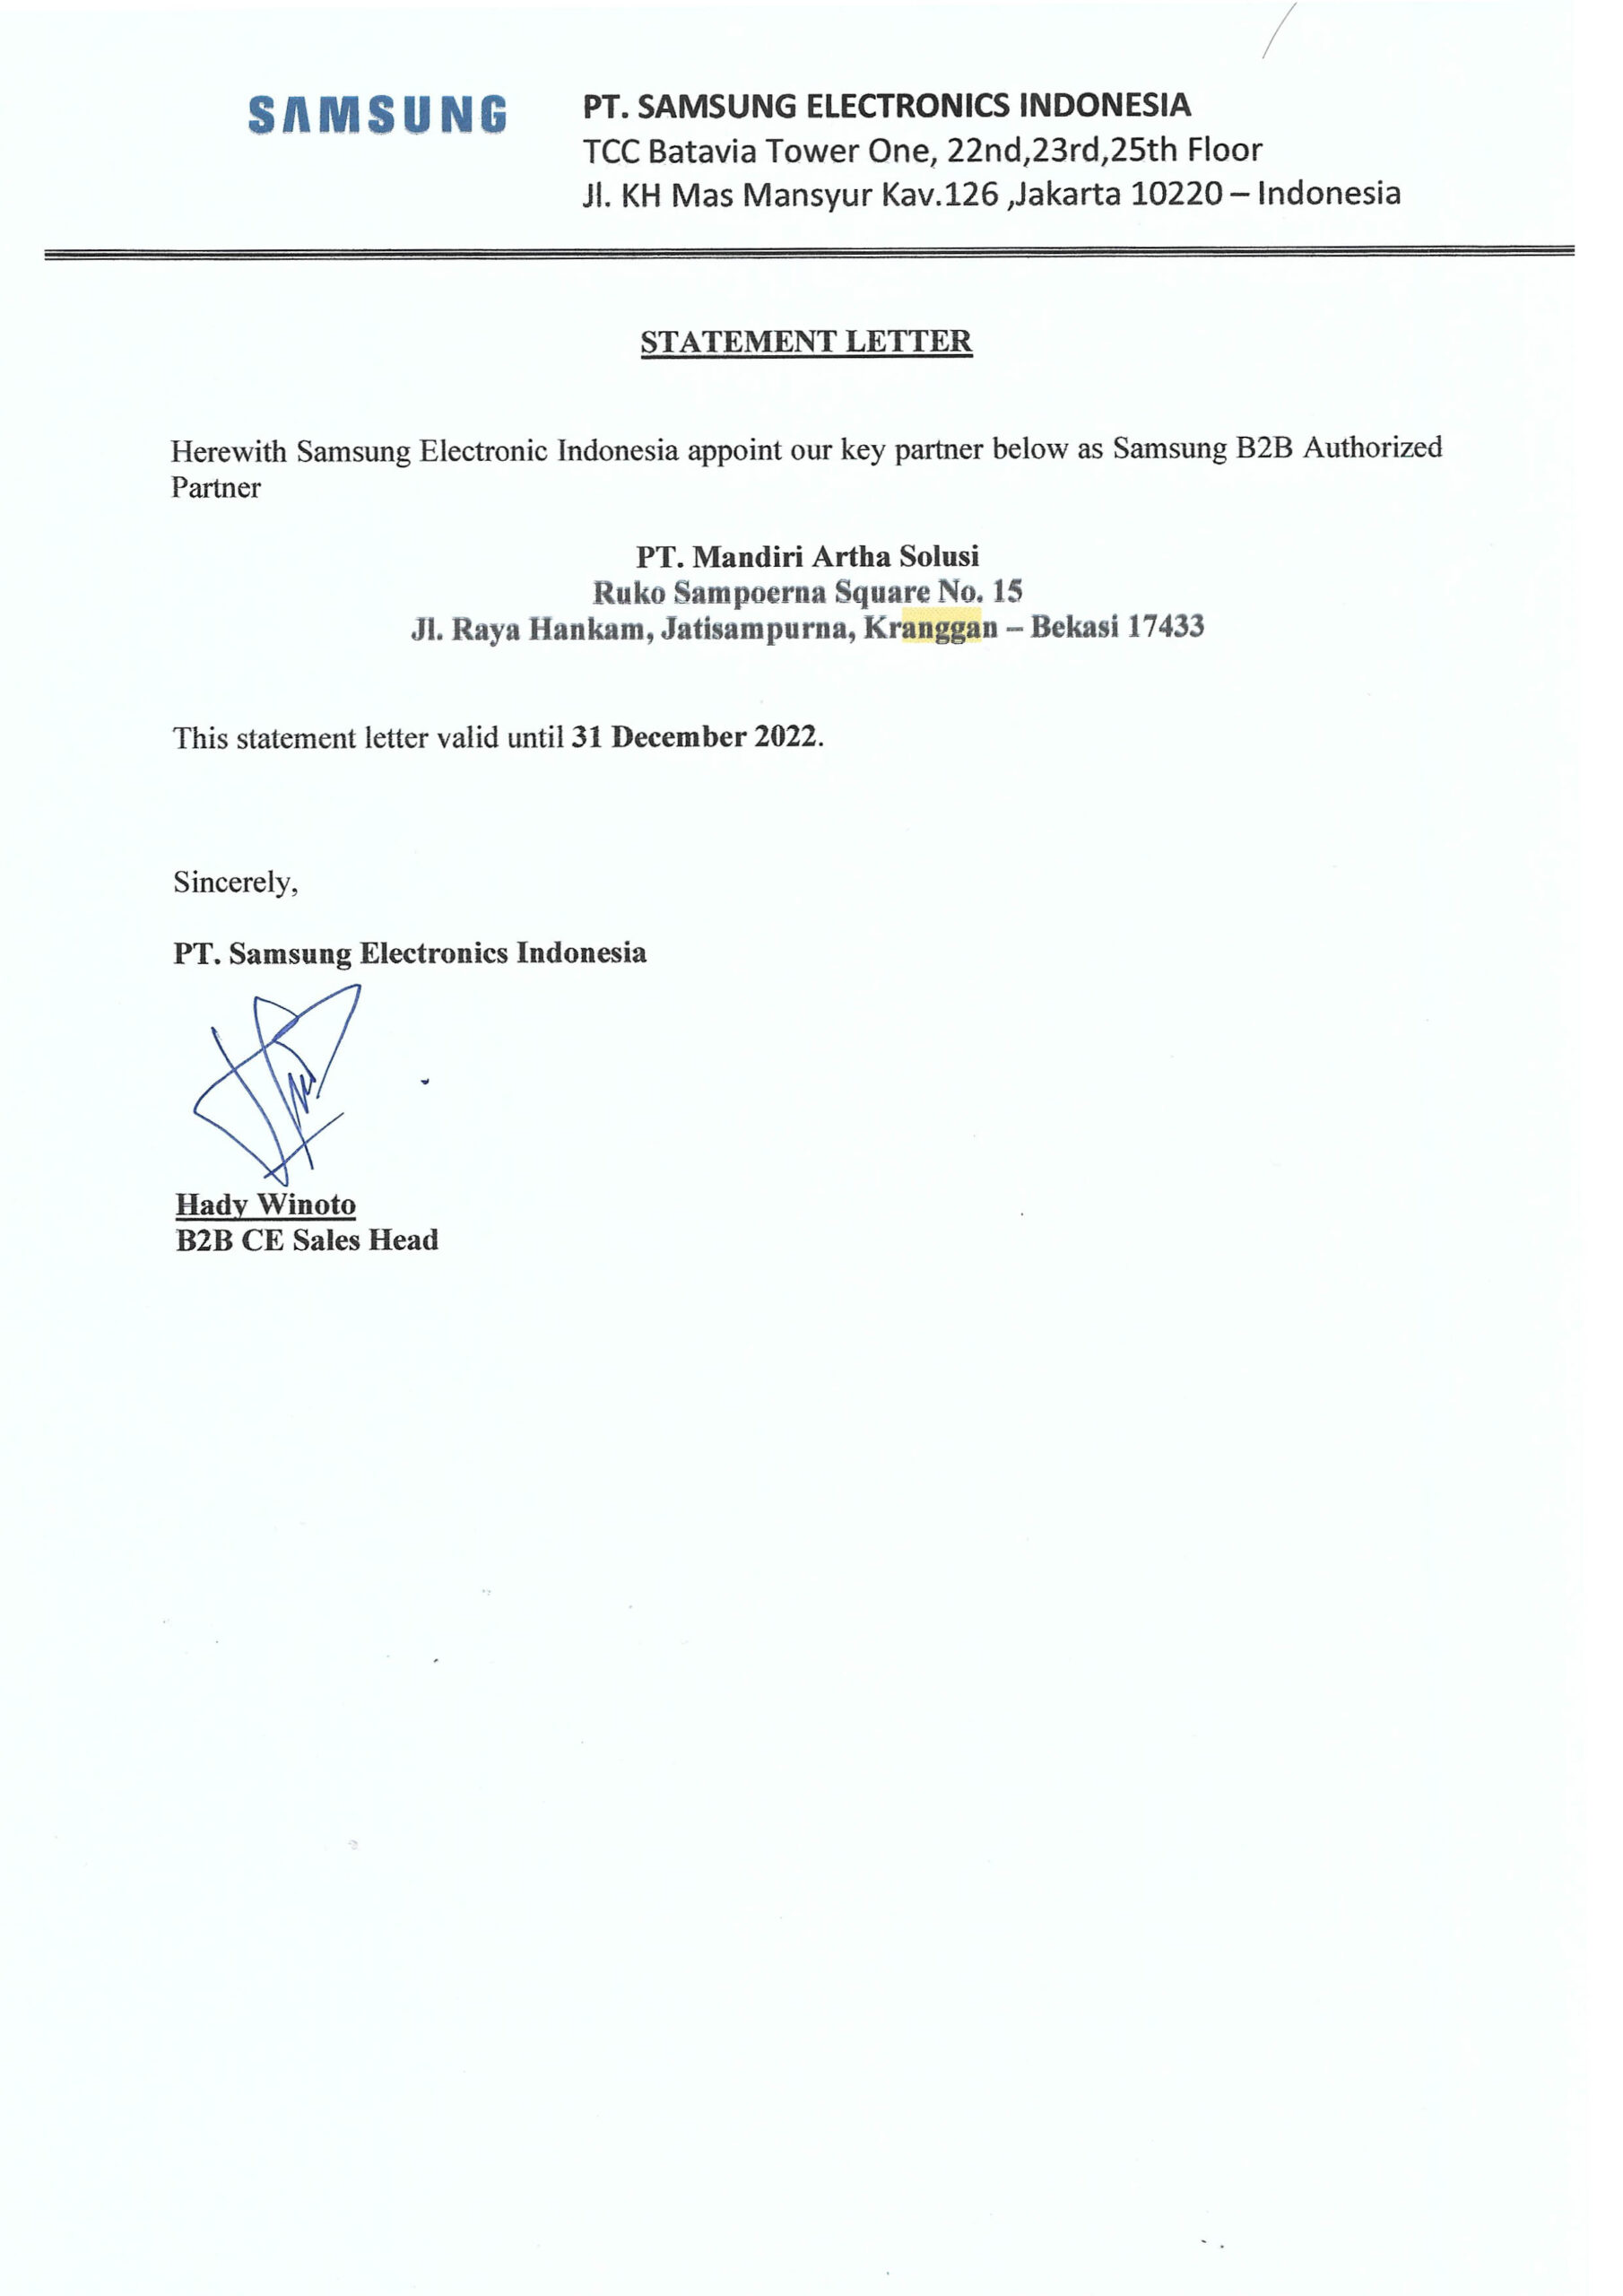 Surat Keterangan Partner Samsung